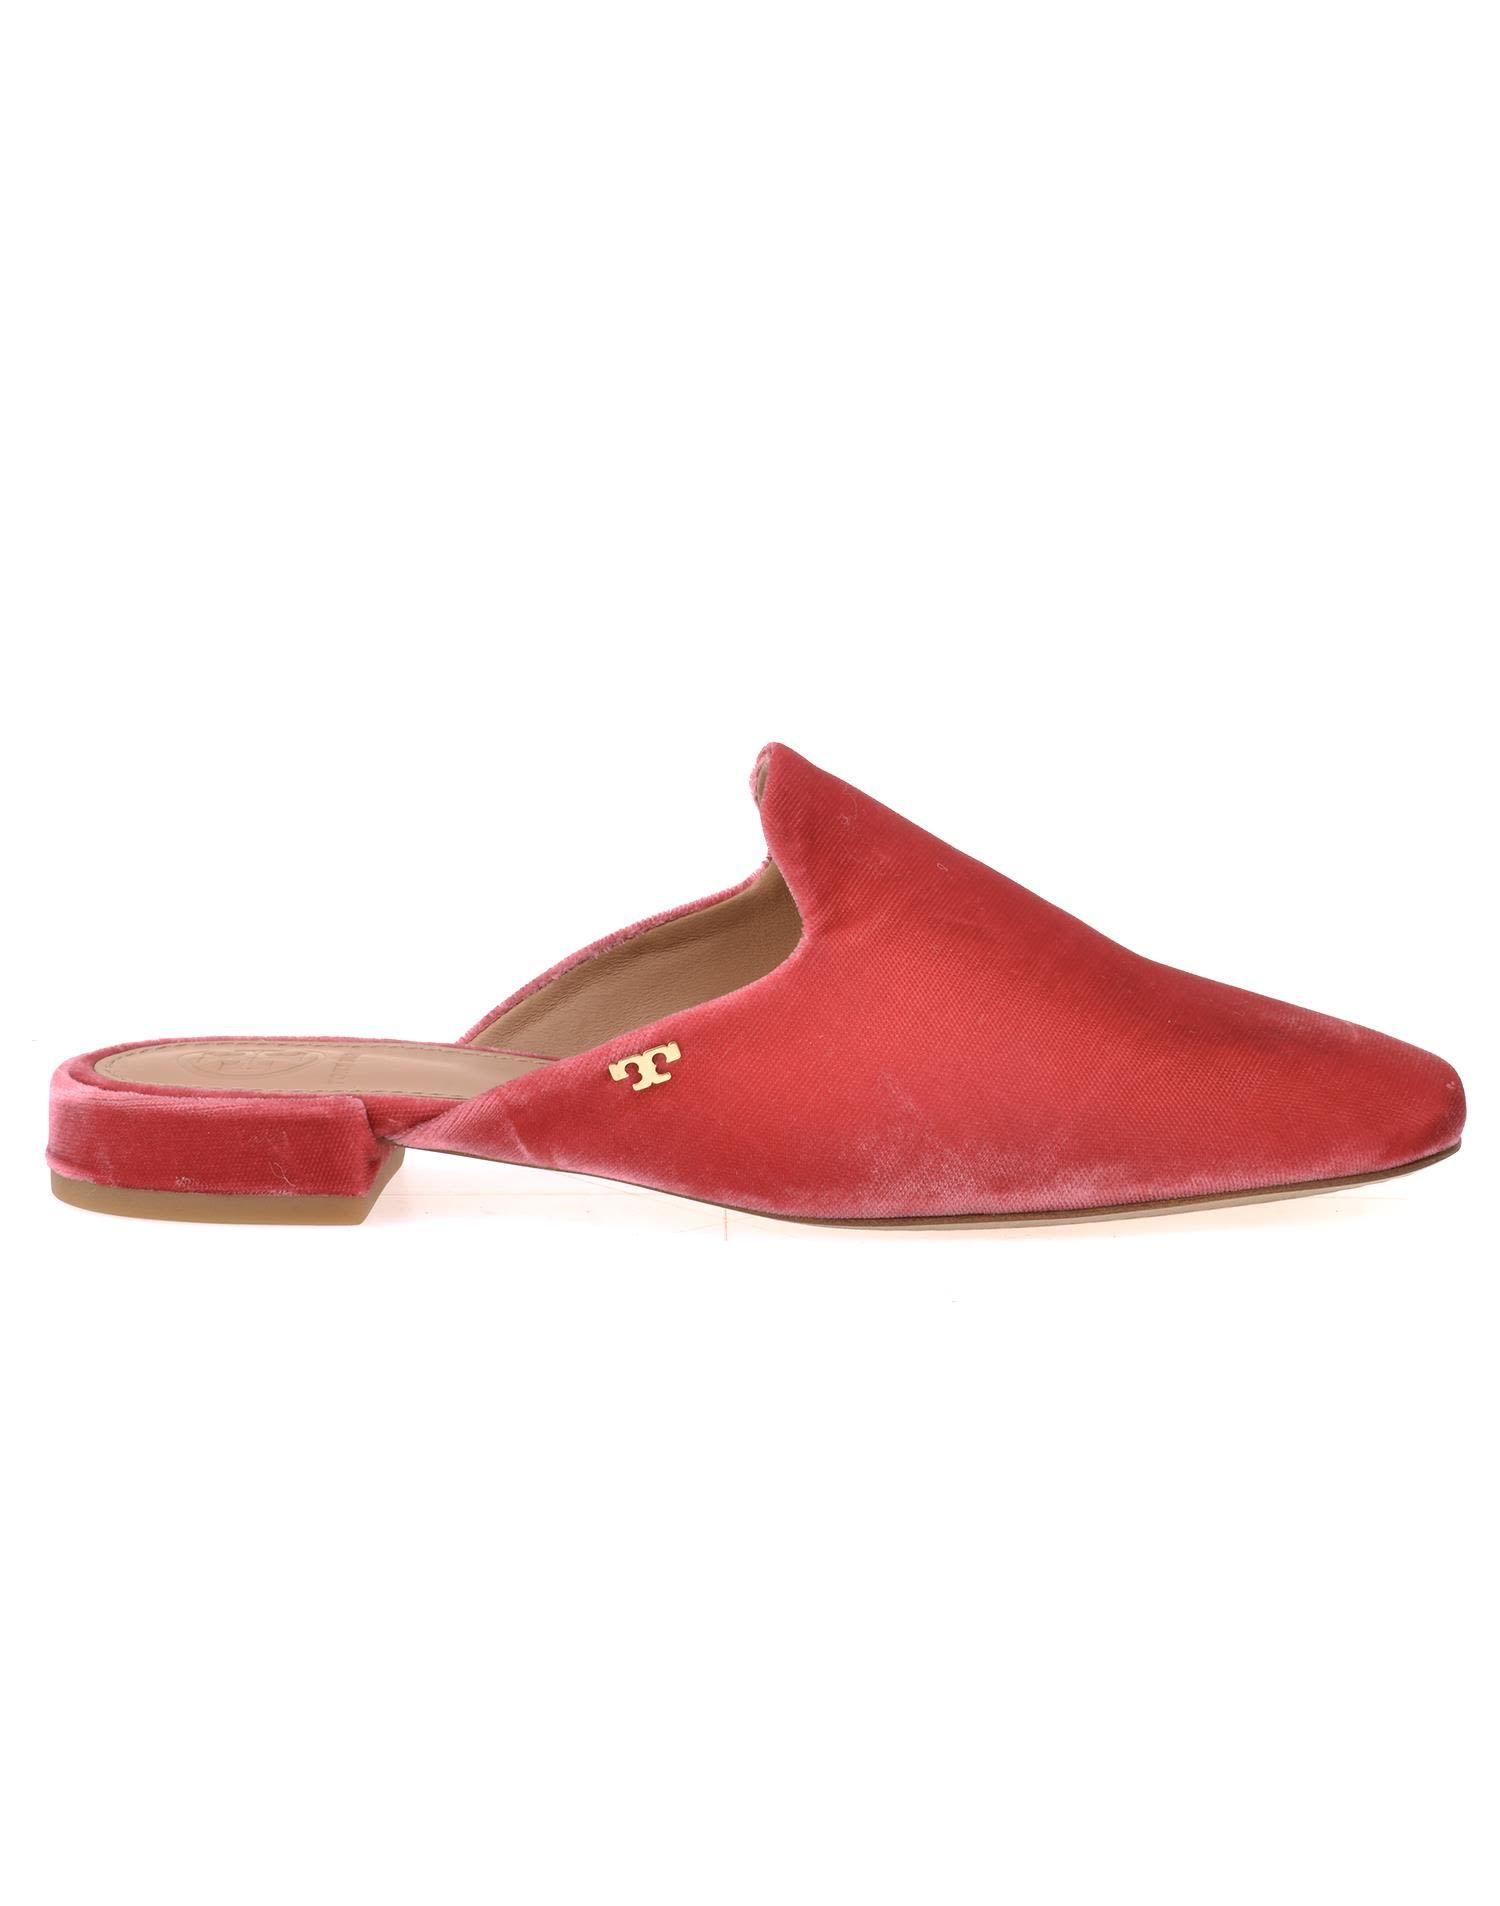 f24ebaf141a TORY BURCH VELVET SLIPPER.  toryburch  shoes